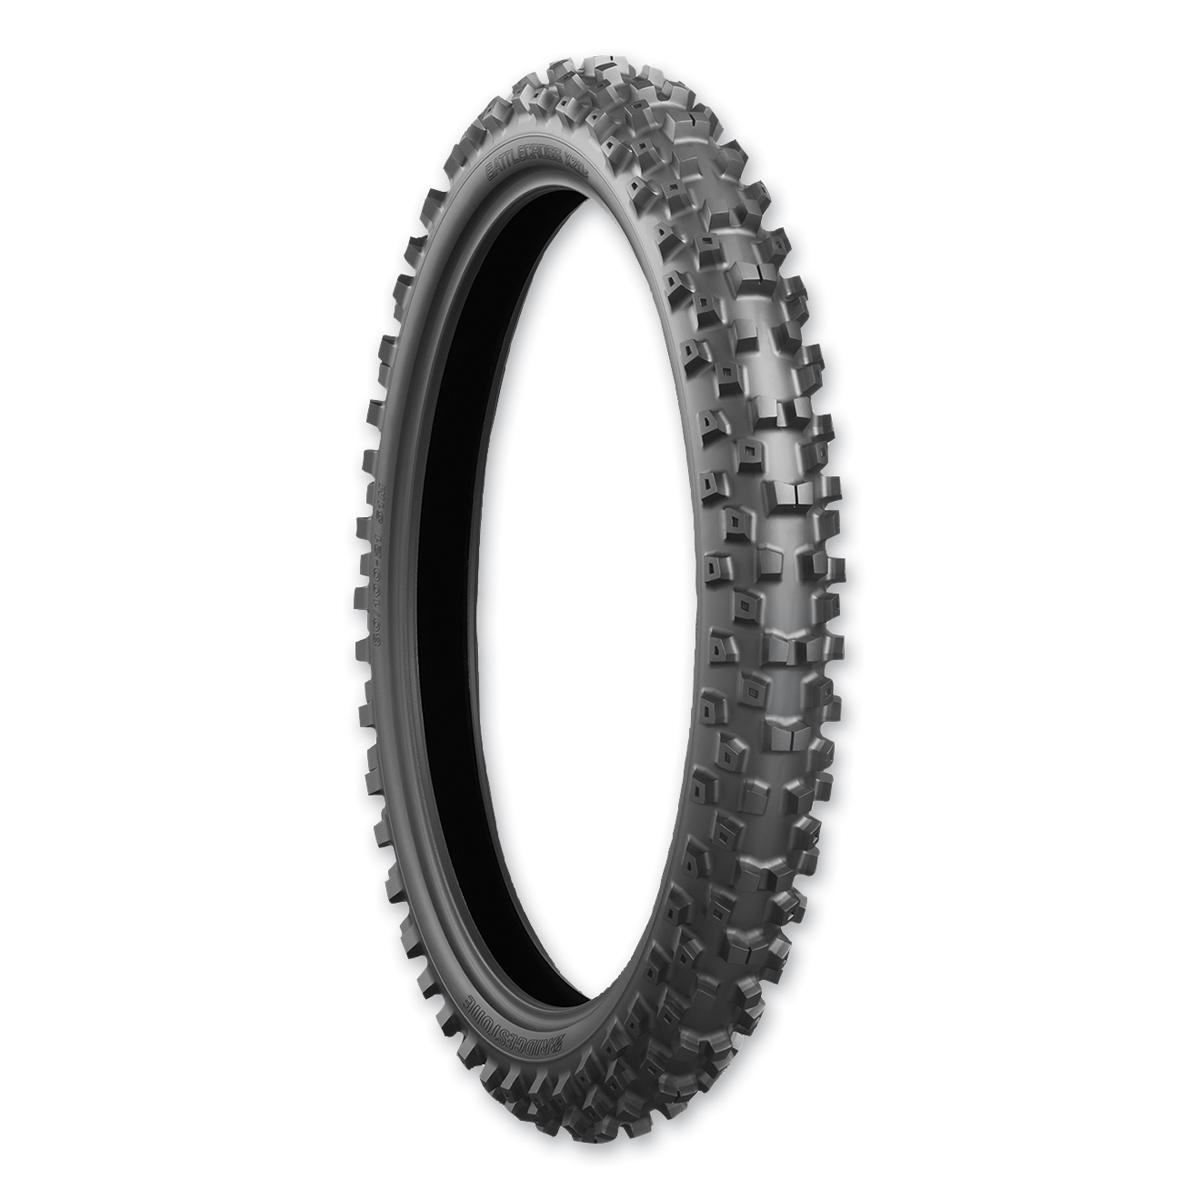 Bridgestone Battlecross X20R 120/80-19 Tire